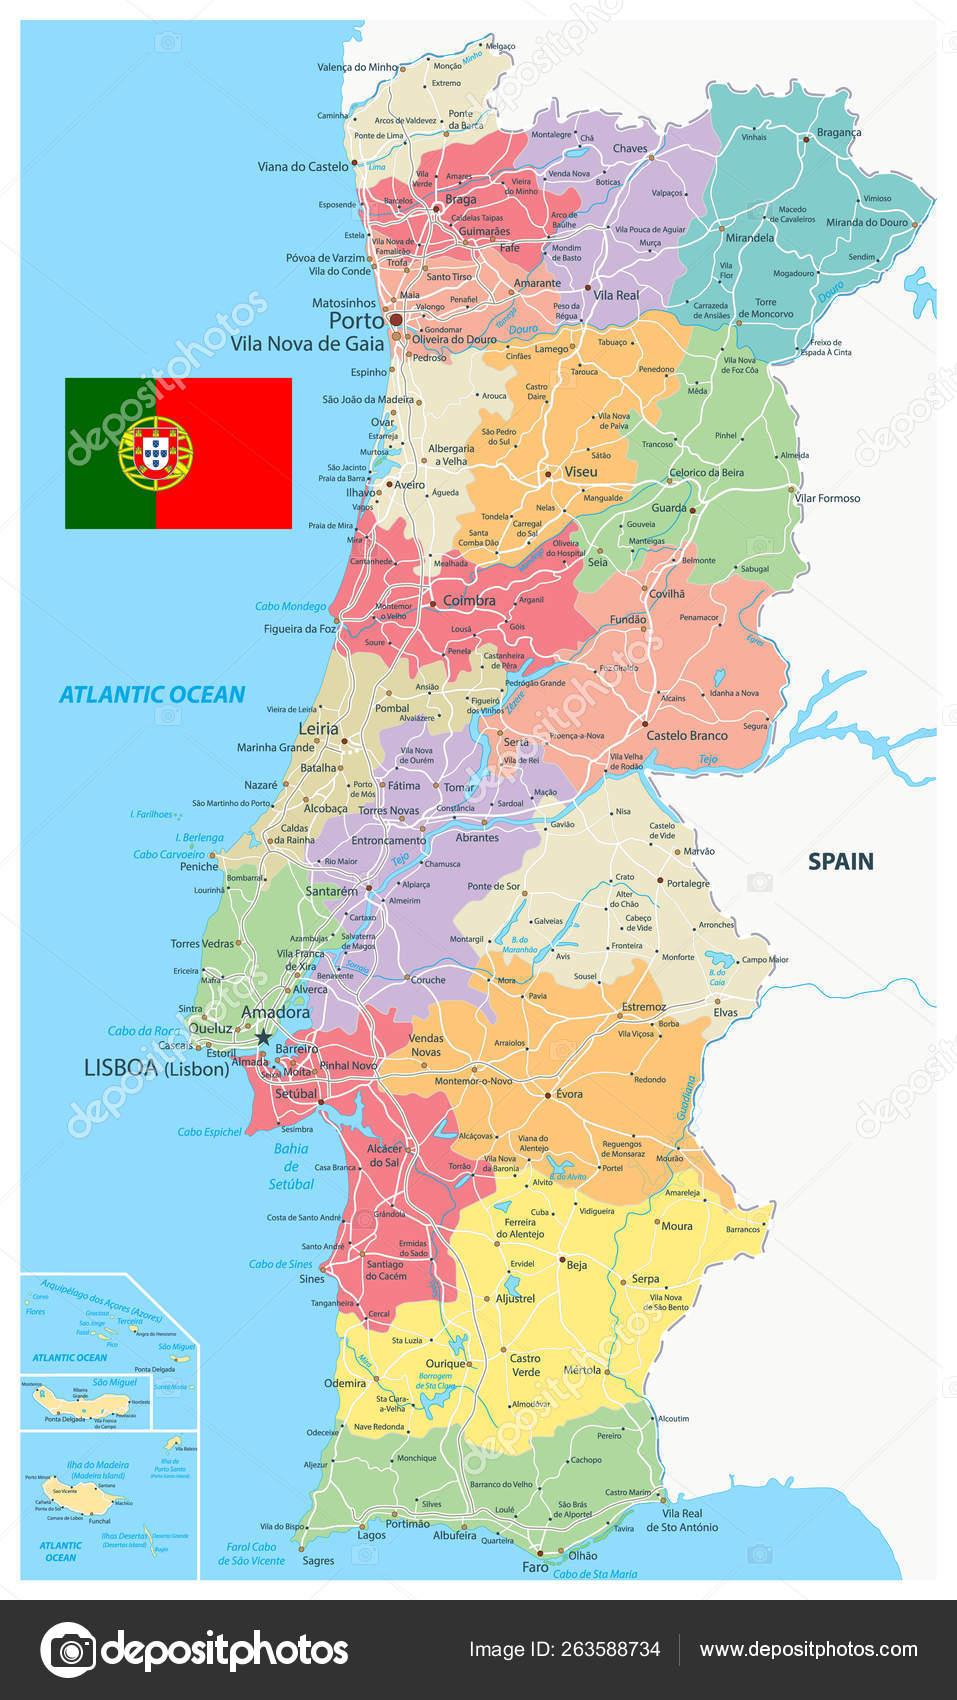 Mapa De Carreteras Portugal.Portugal Mapa Dedivision Administrativa Y Carreteras